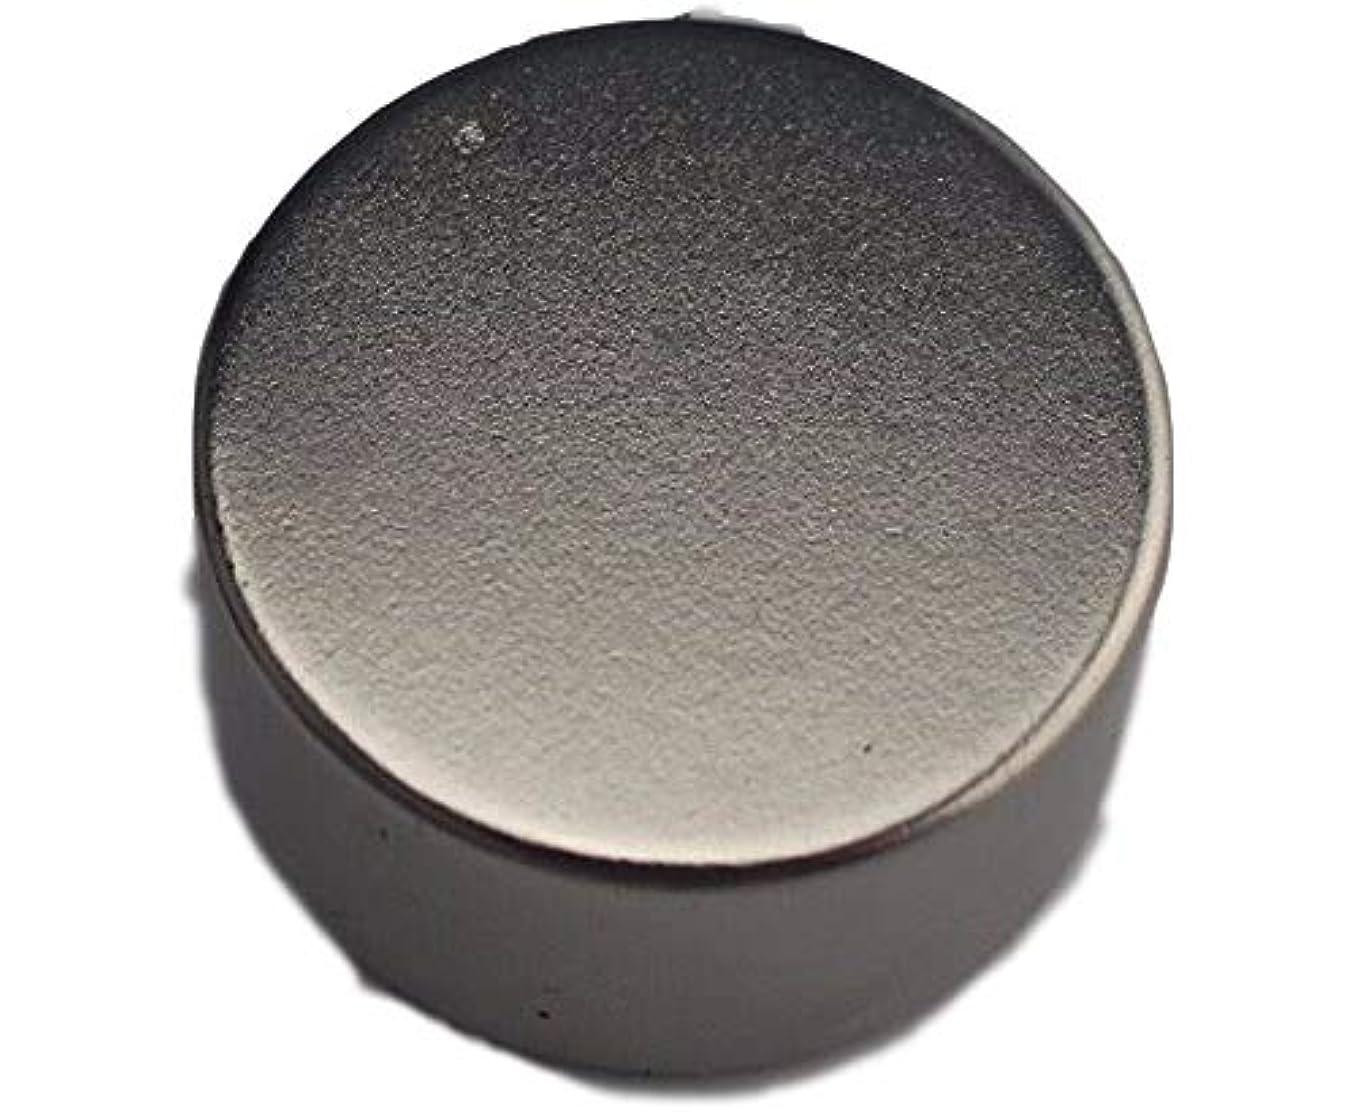 Tozz Pro Round Magnetic Bottle Cap Catcher ?Porter - 60 Caps?